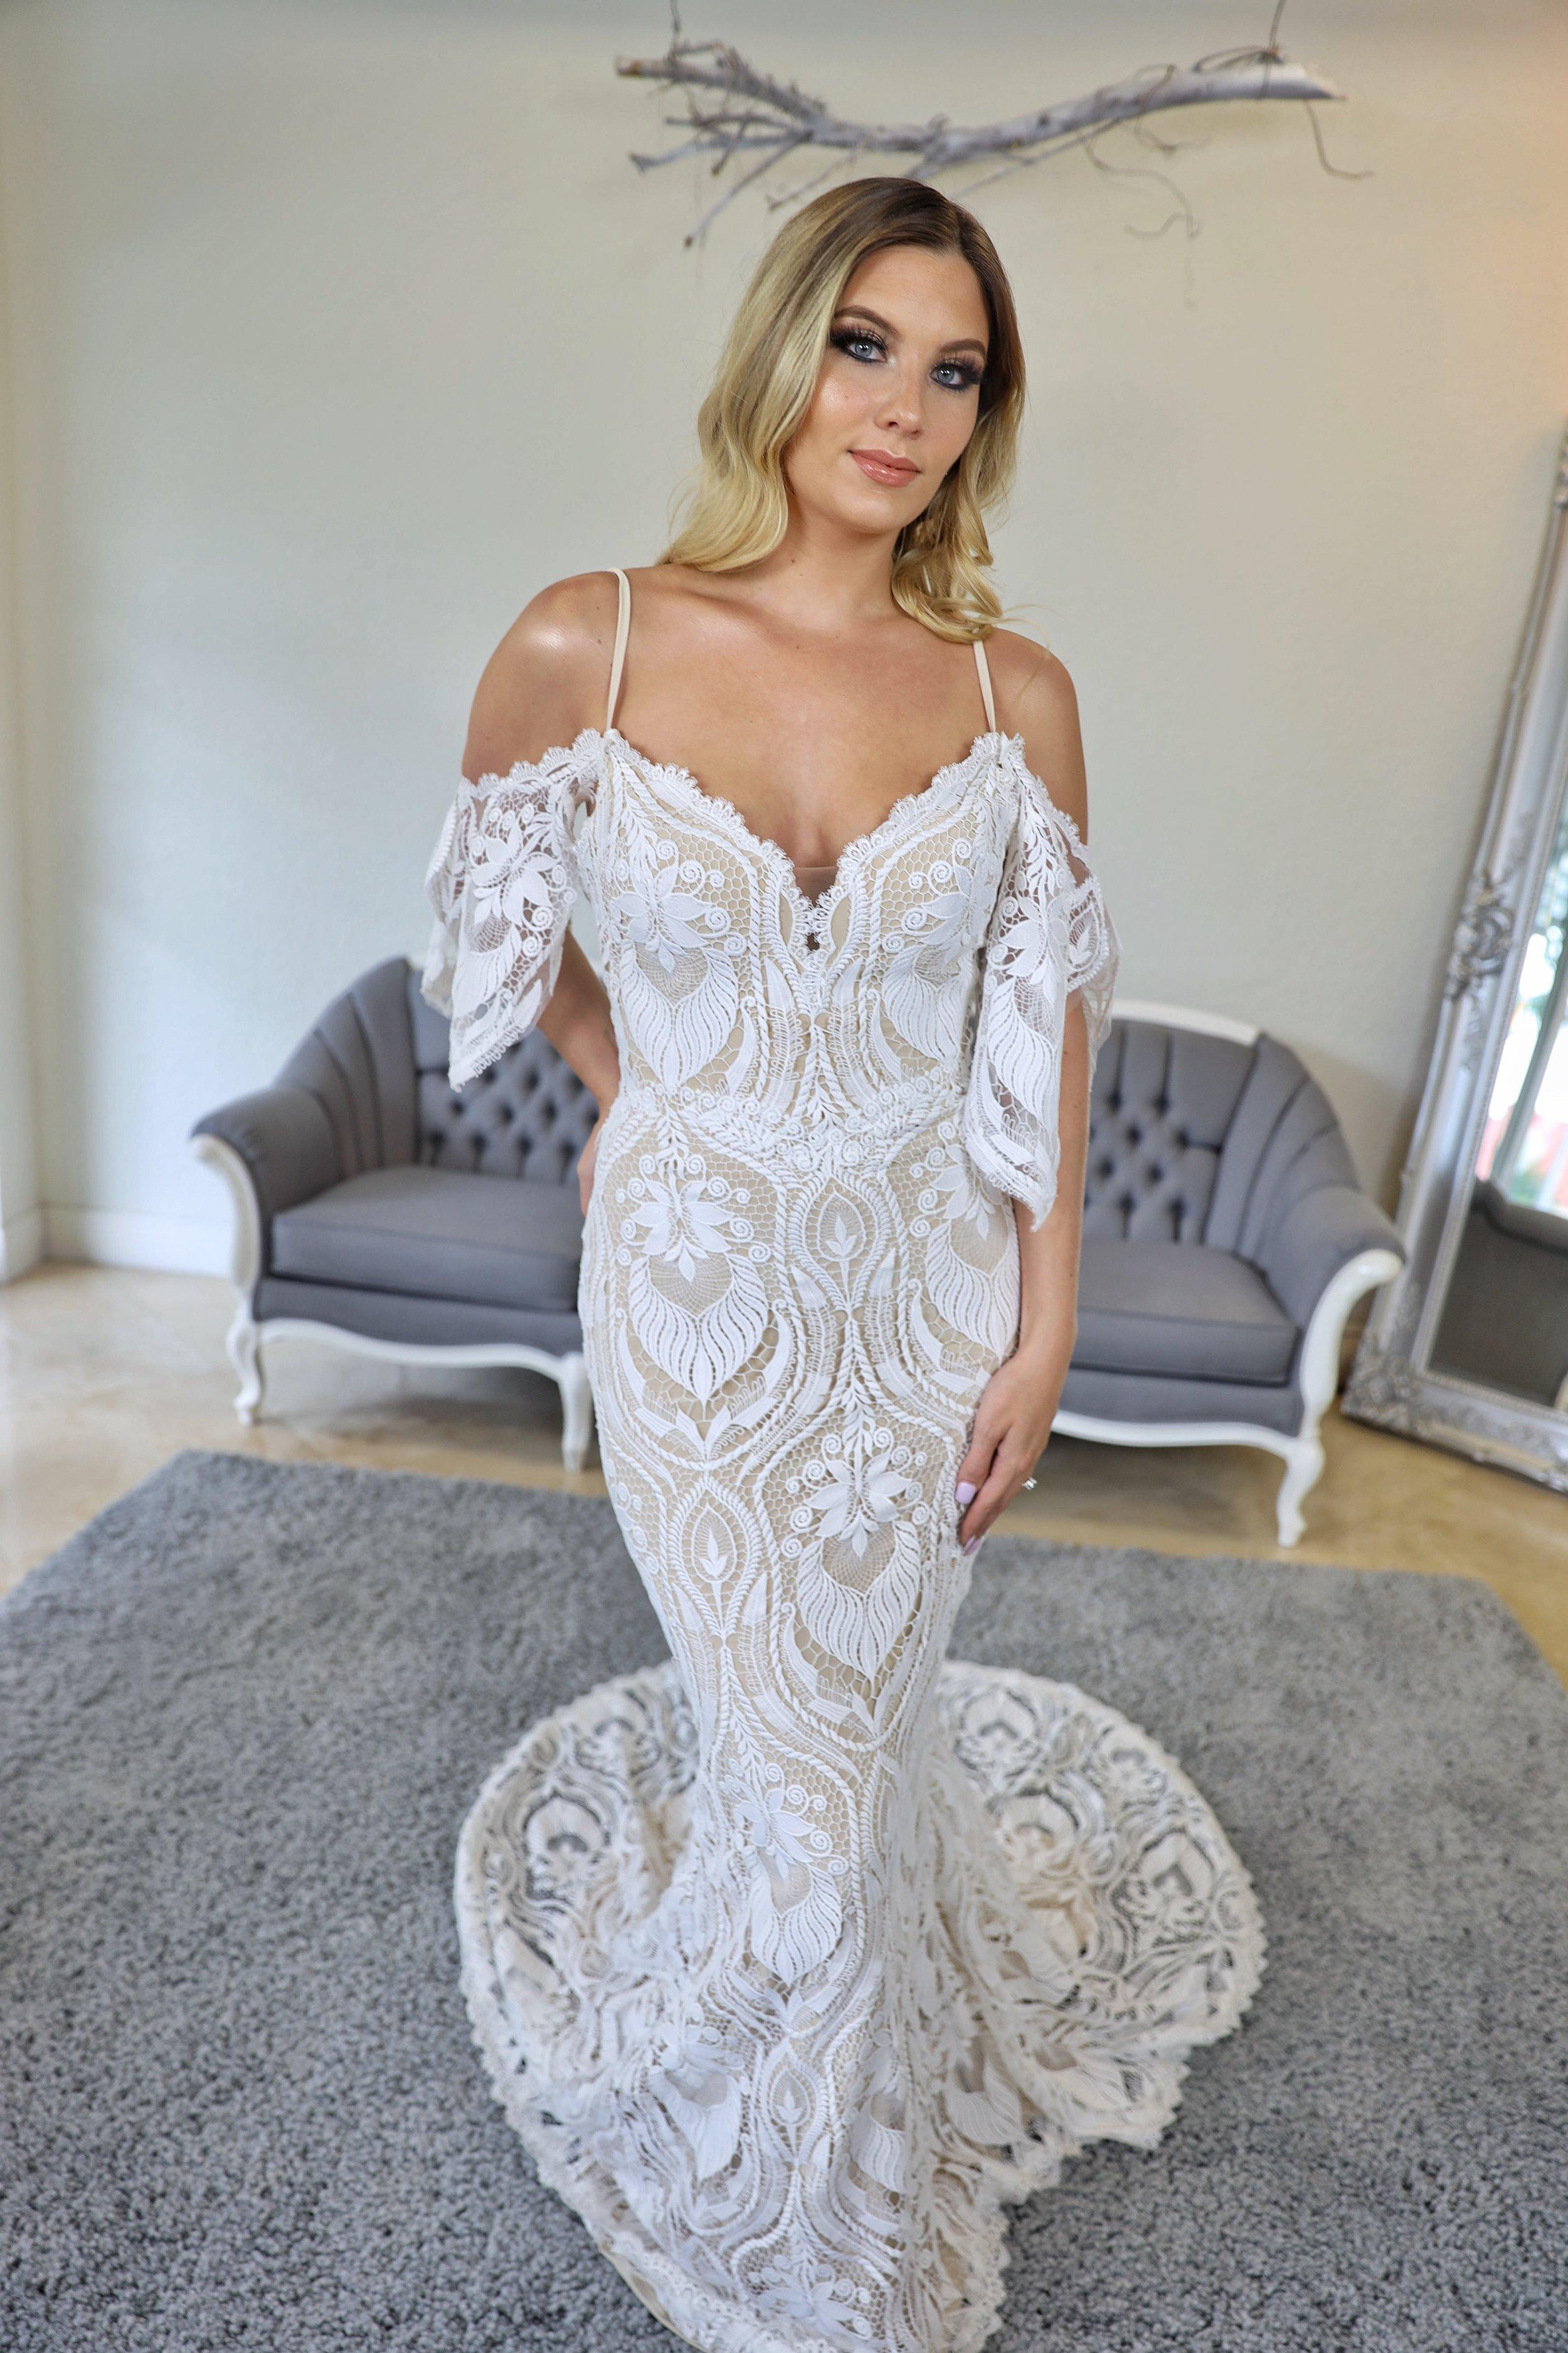 a classic boho dress